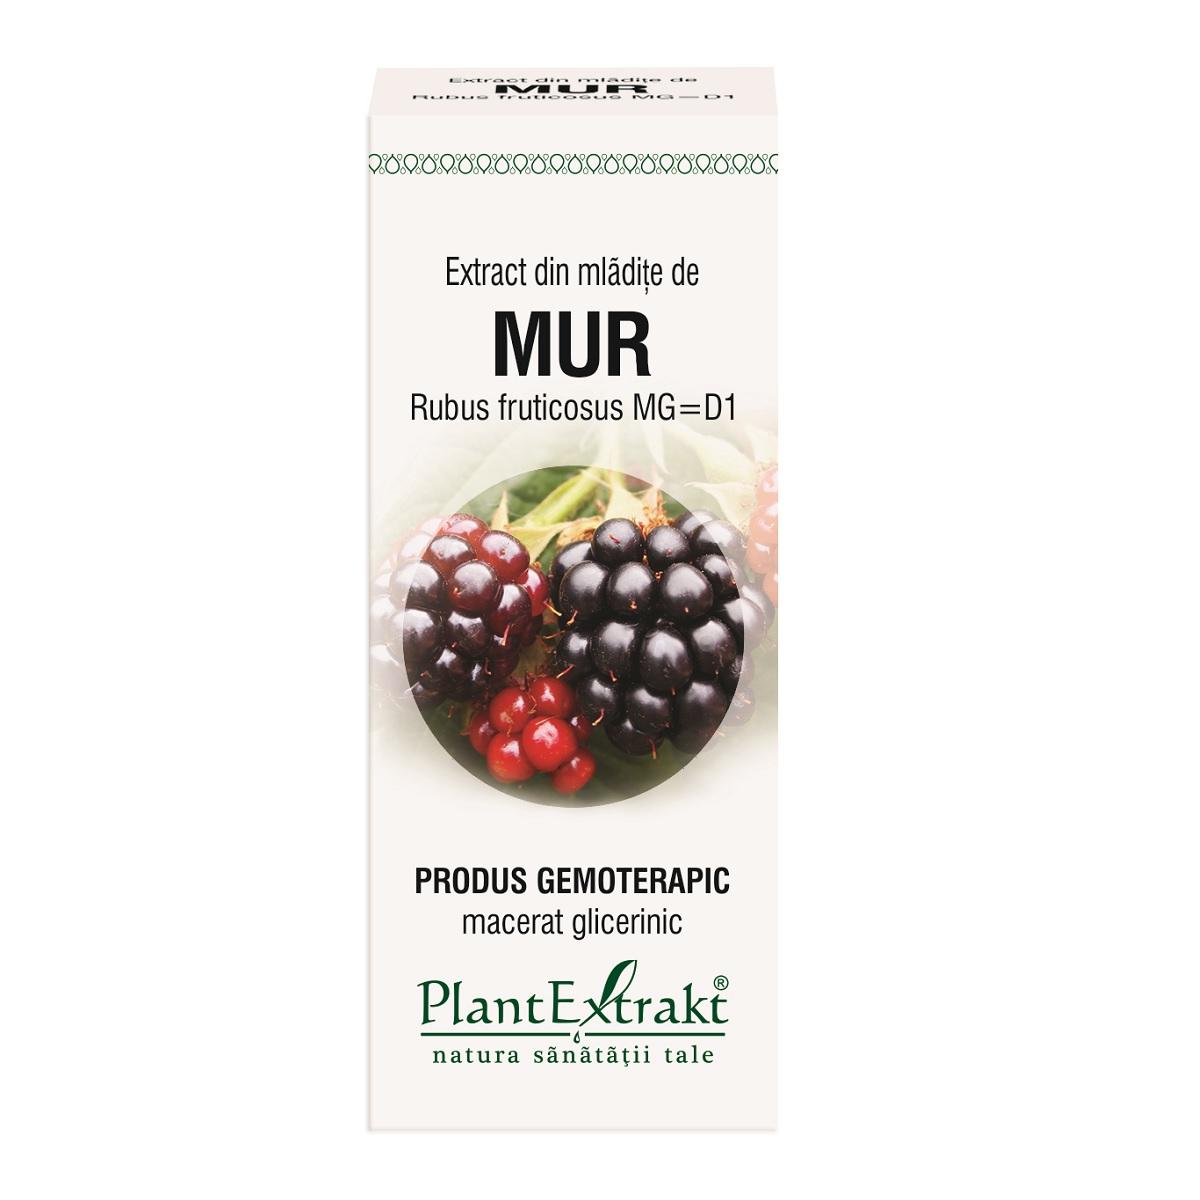 Extract din mlădițe de mur, 50 ml, Plant Extrakt